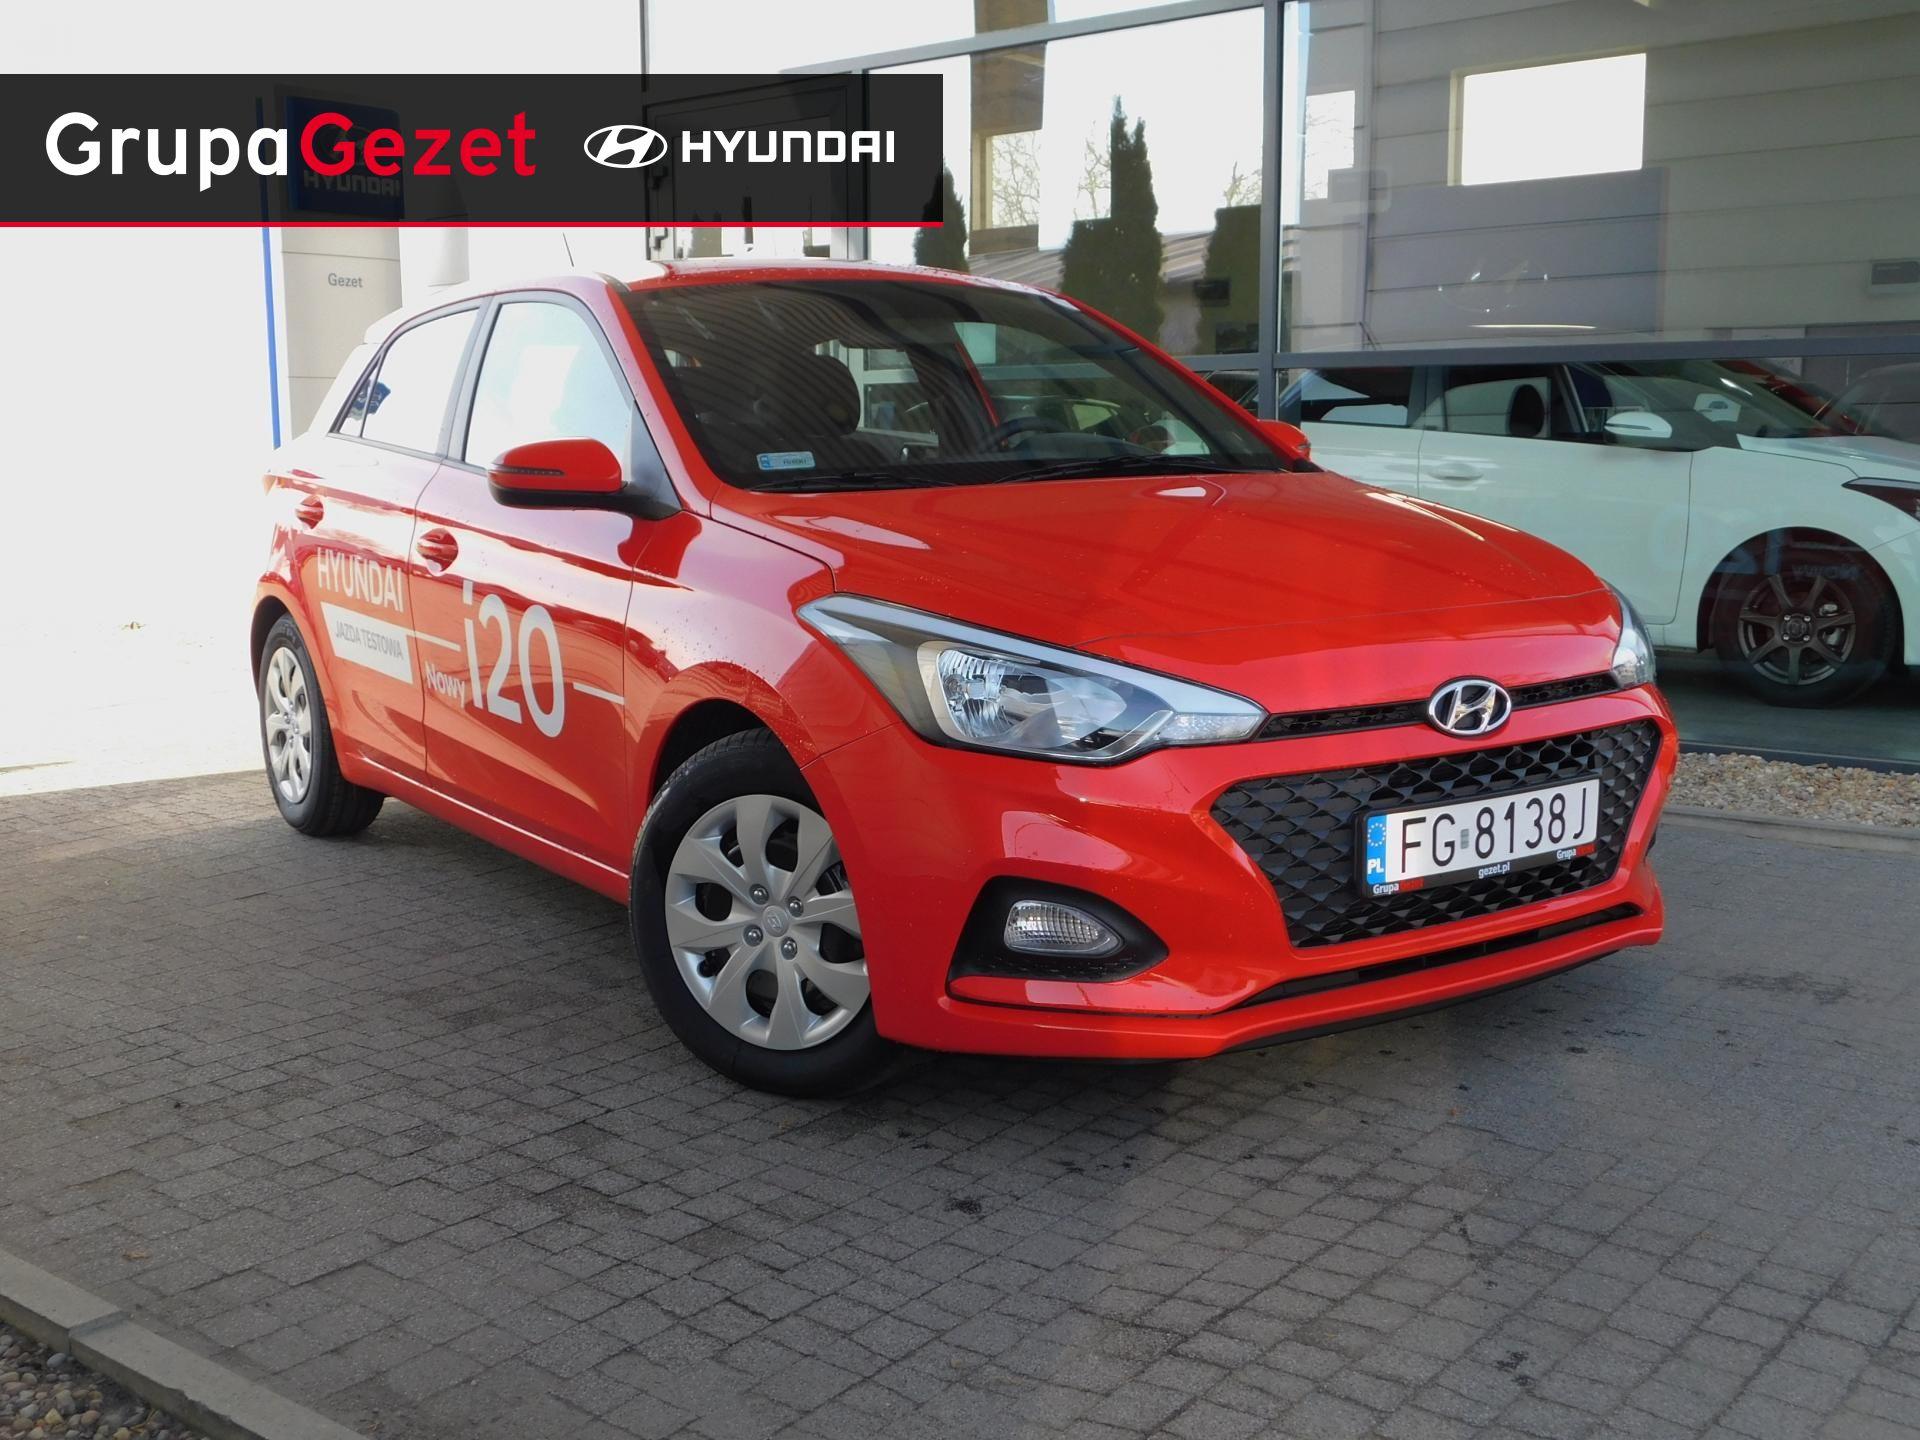 Ogromny Hyundai i20 1,2 MPI (84KM) GET! - Tomato Red DEMO | Kolor KT07